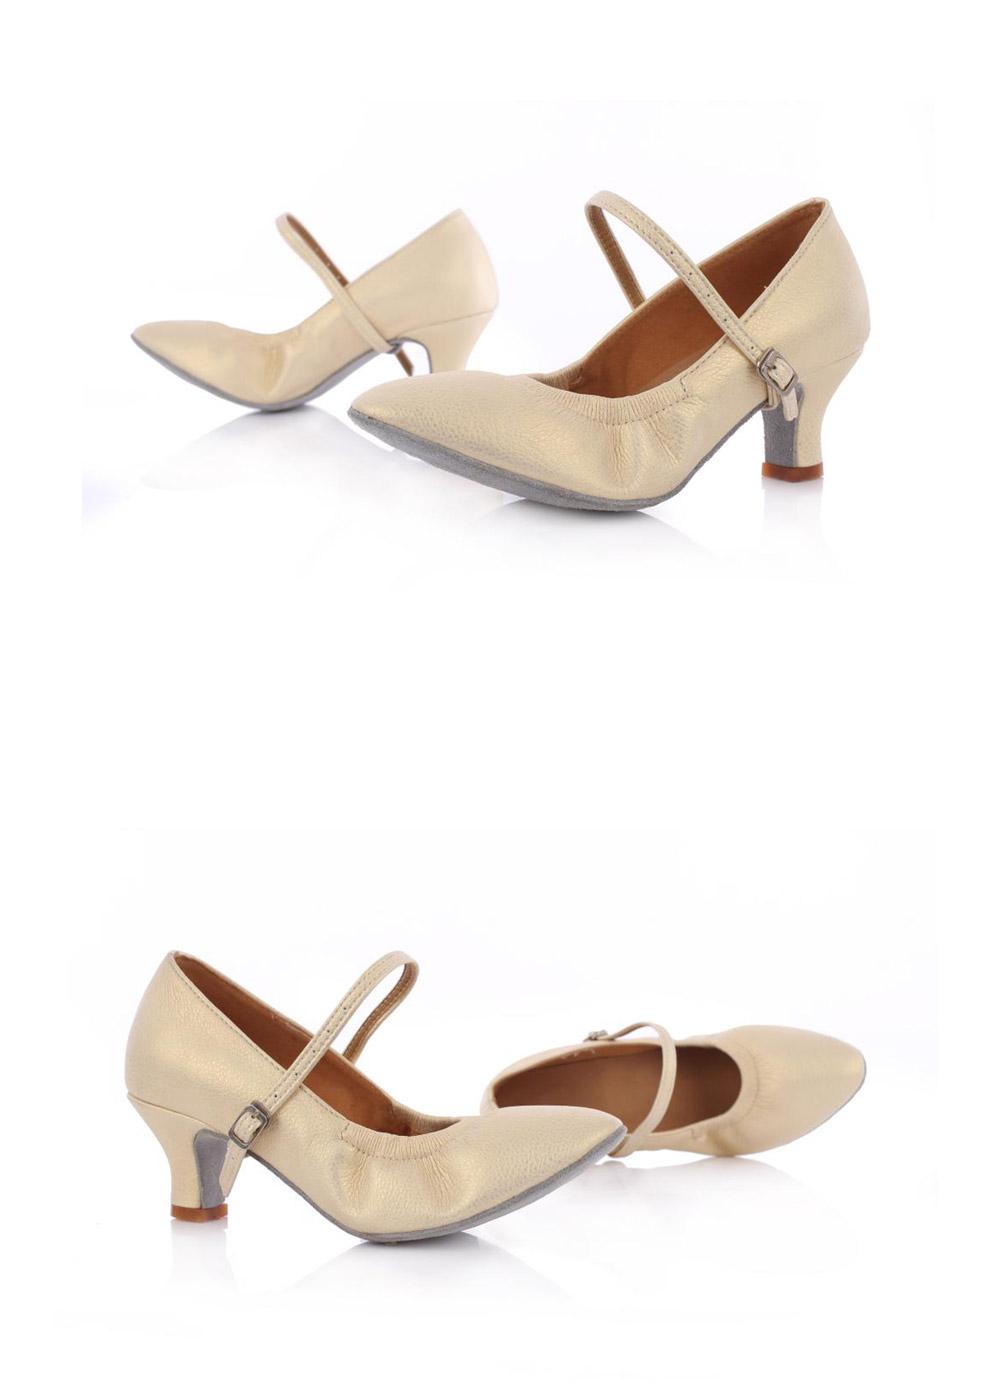 Hot Selling Latin Dancing Shoes For Women Soft Bottom Tango Shoes 57Cm Modern Salsa Dance Shoes Female Ballroom Dancing Shoes (4)